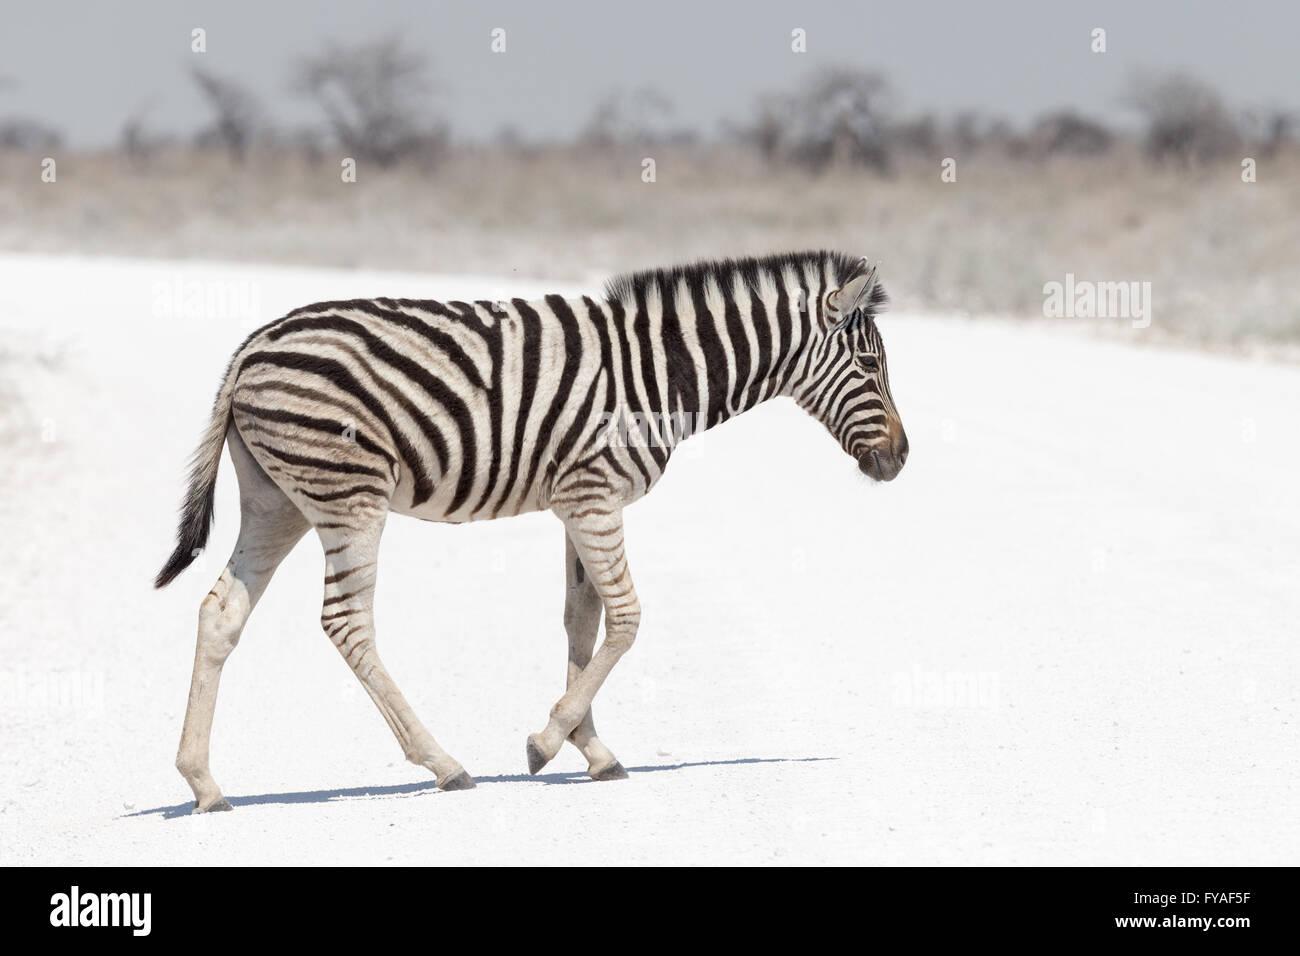 Plain's Zebra Chapman la gara del Parco Nazionale di Etosha Namibia Immagini Stock